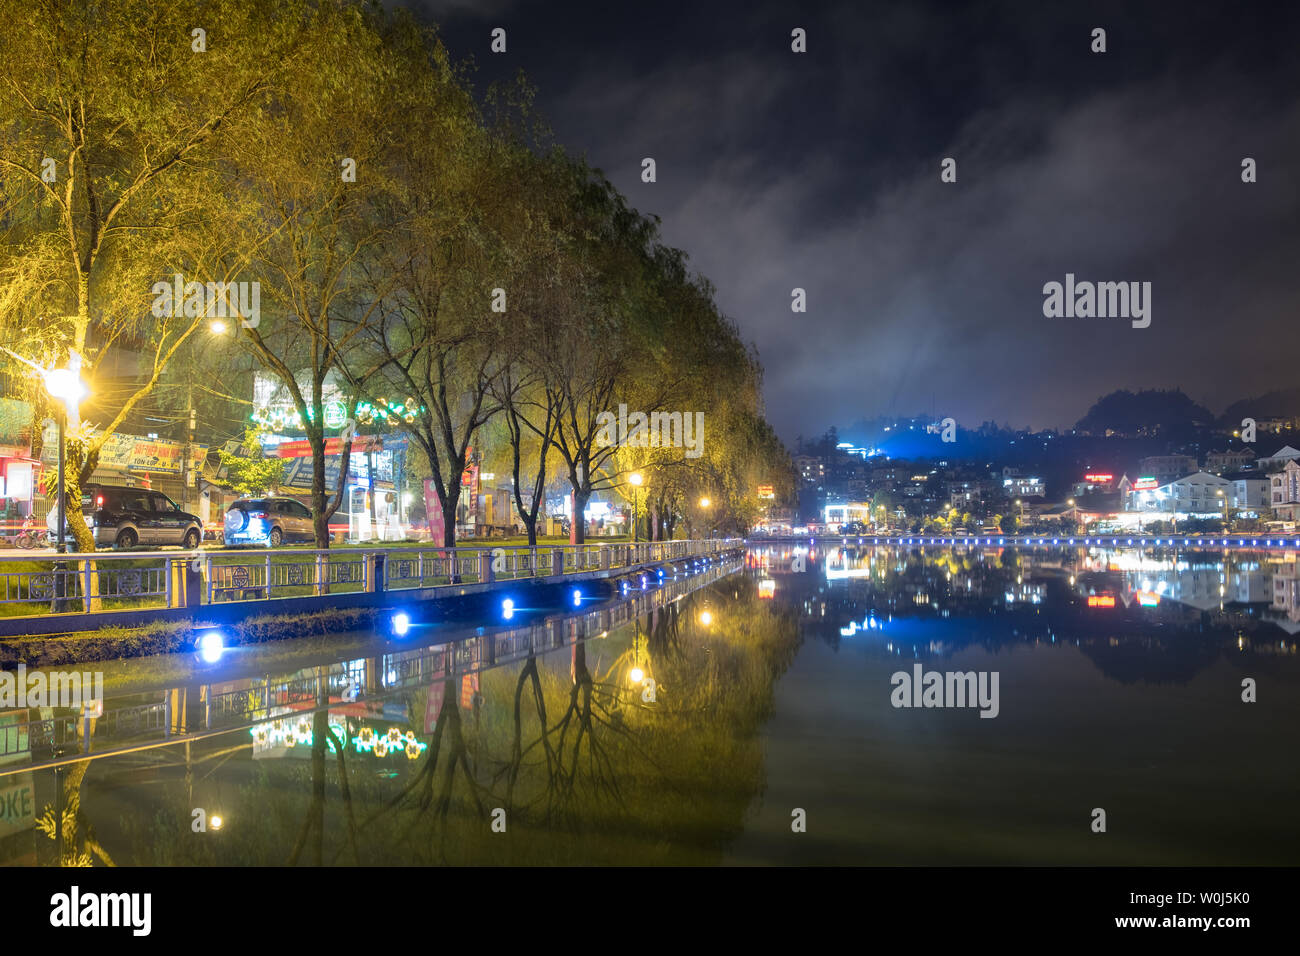 Sapa, Vietnam : Sep 07 2017 : Viewpoint lagoon decorated beautiful lights with willows tree in Sapa city, Vietnam - Stock Image